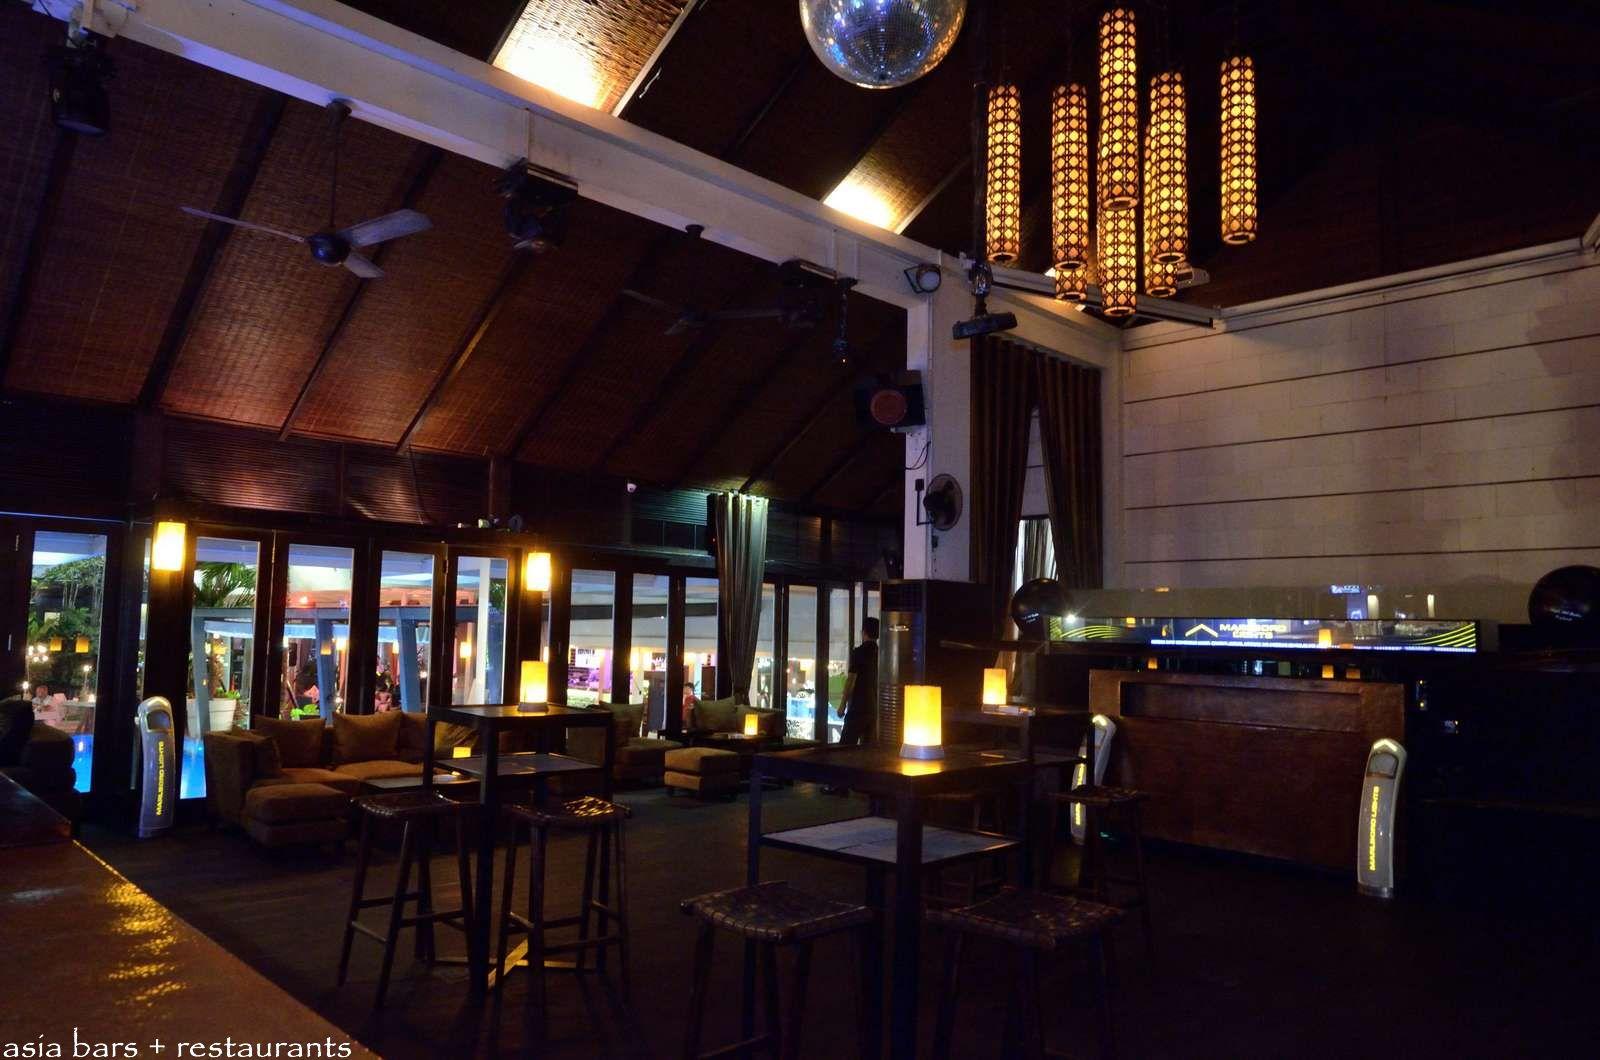 Hu U Bar Stellar Nightclub In Bali Indonesia Asia Bars